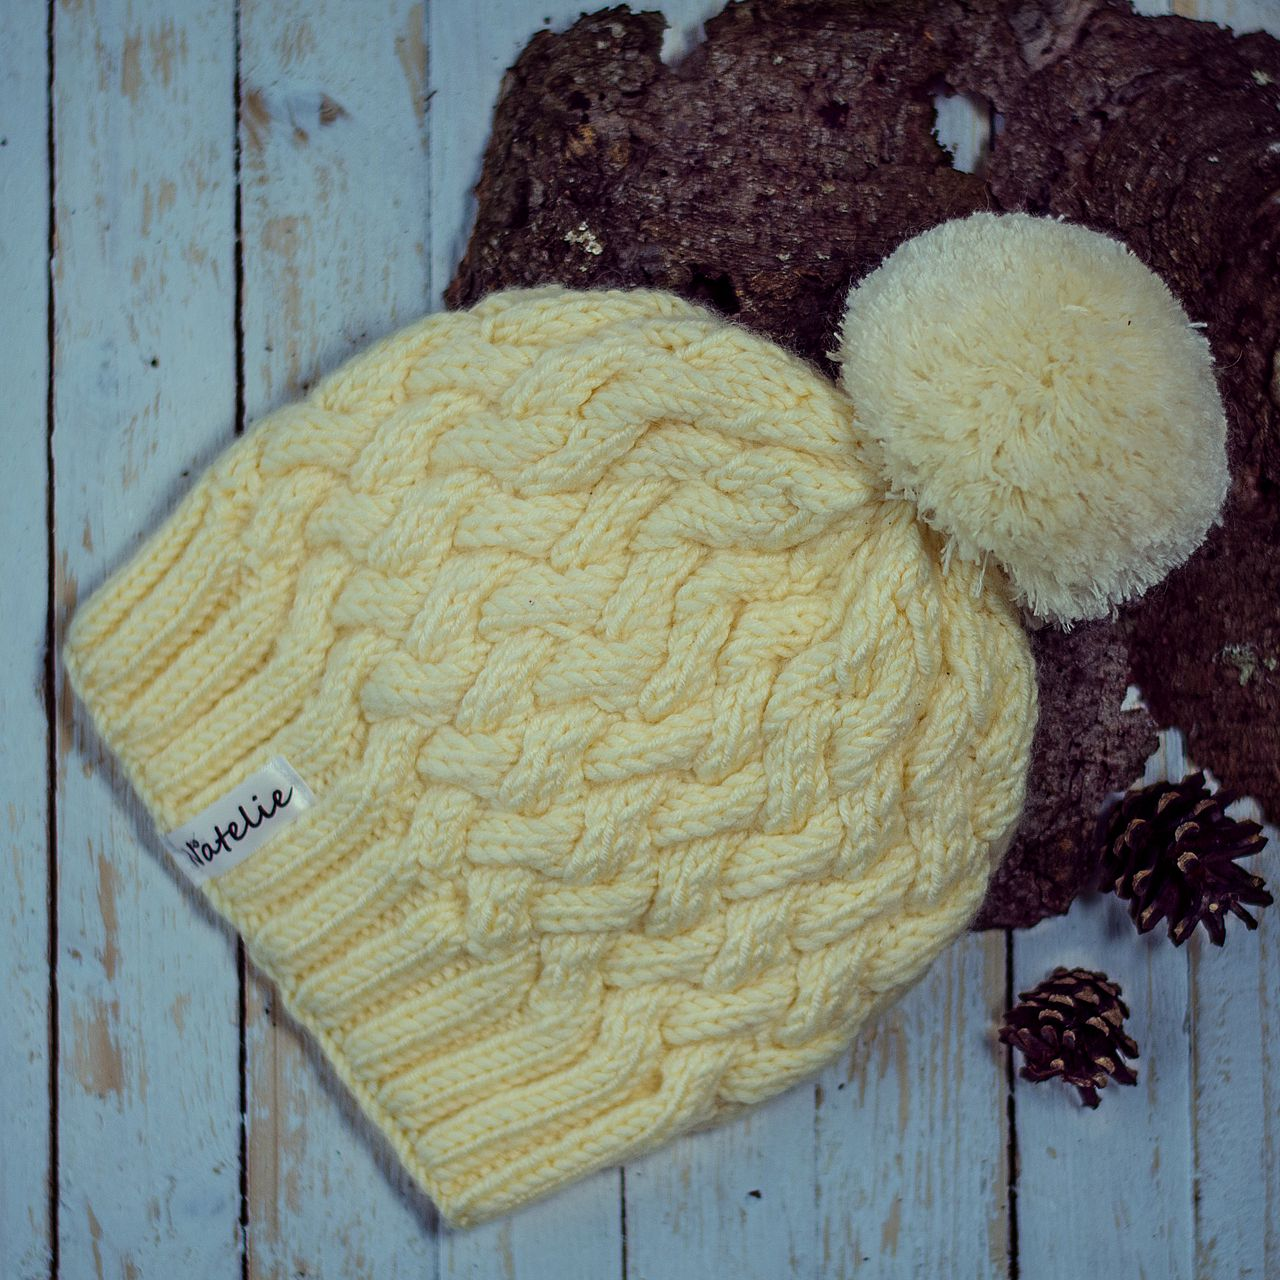 спицами аксессуар одежда продажа шапка шапкаспомпоном вязание вязанаяшапка ручнаяработа